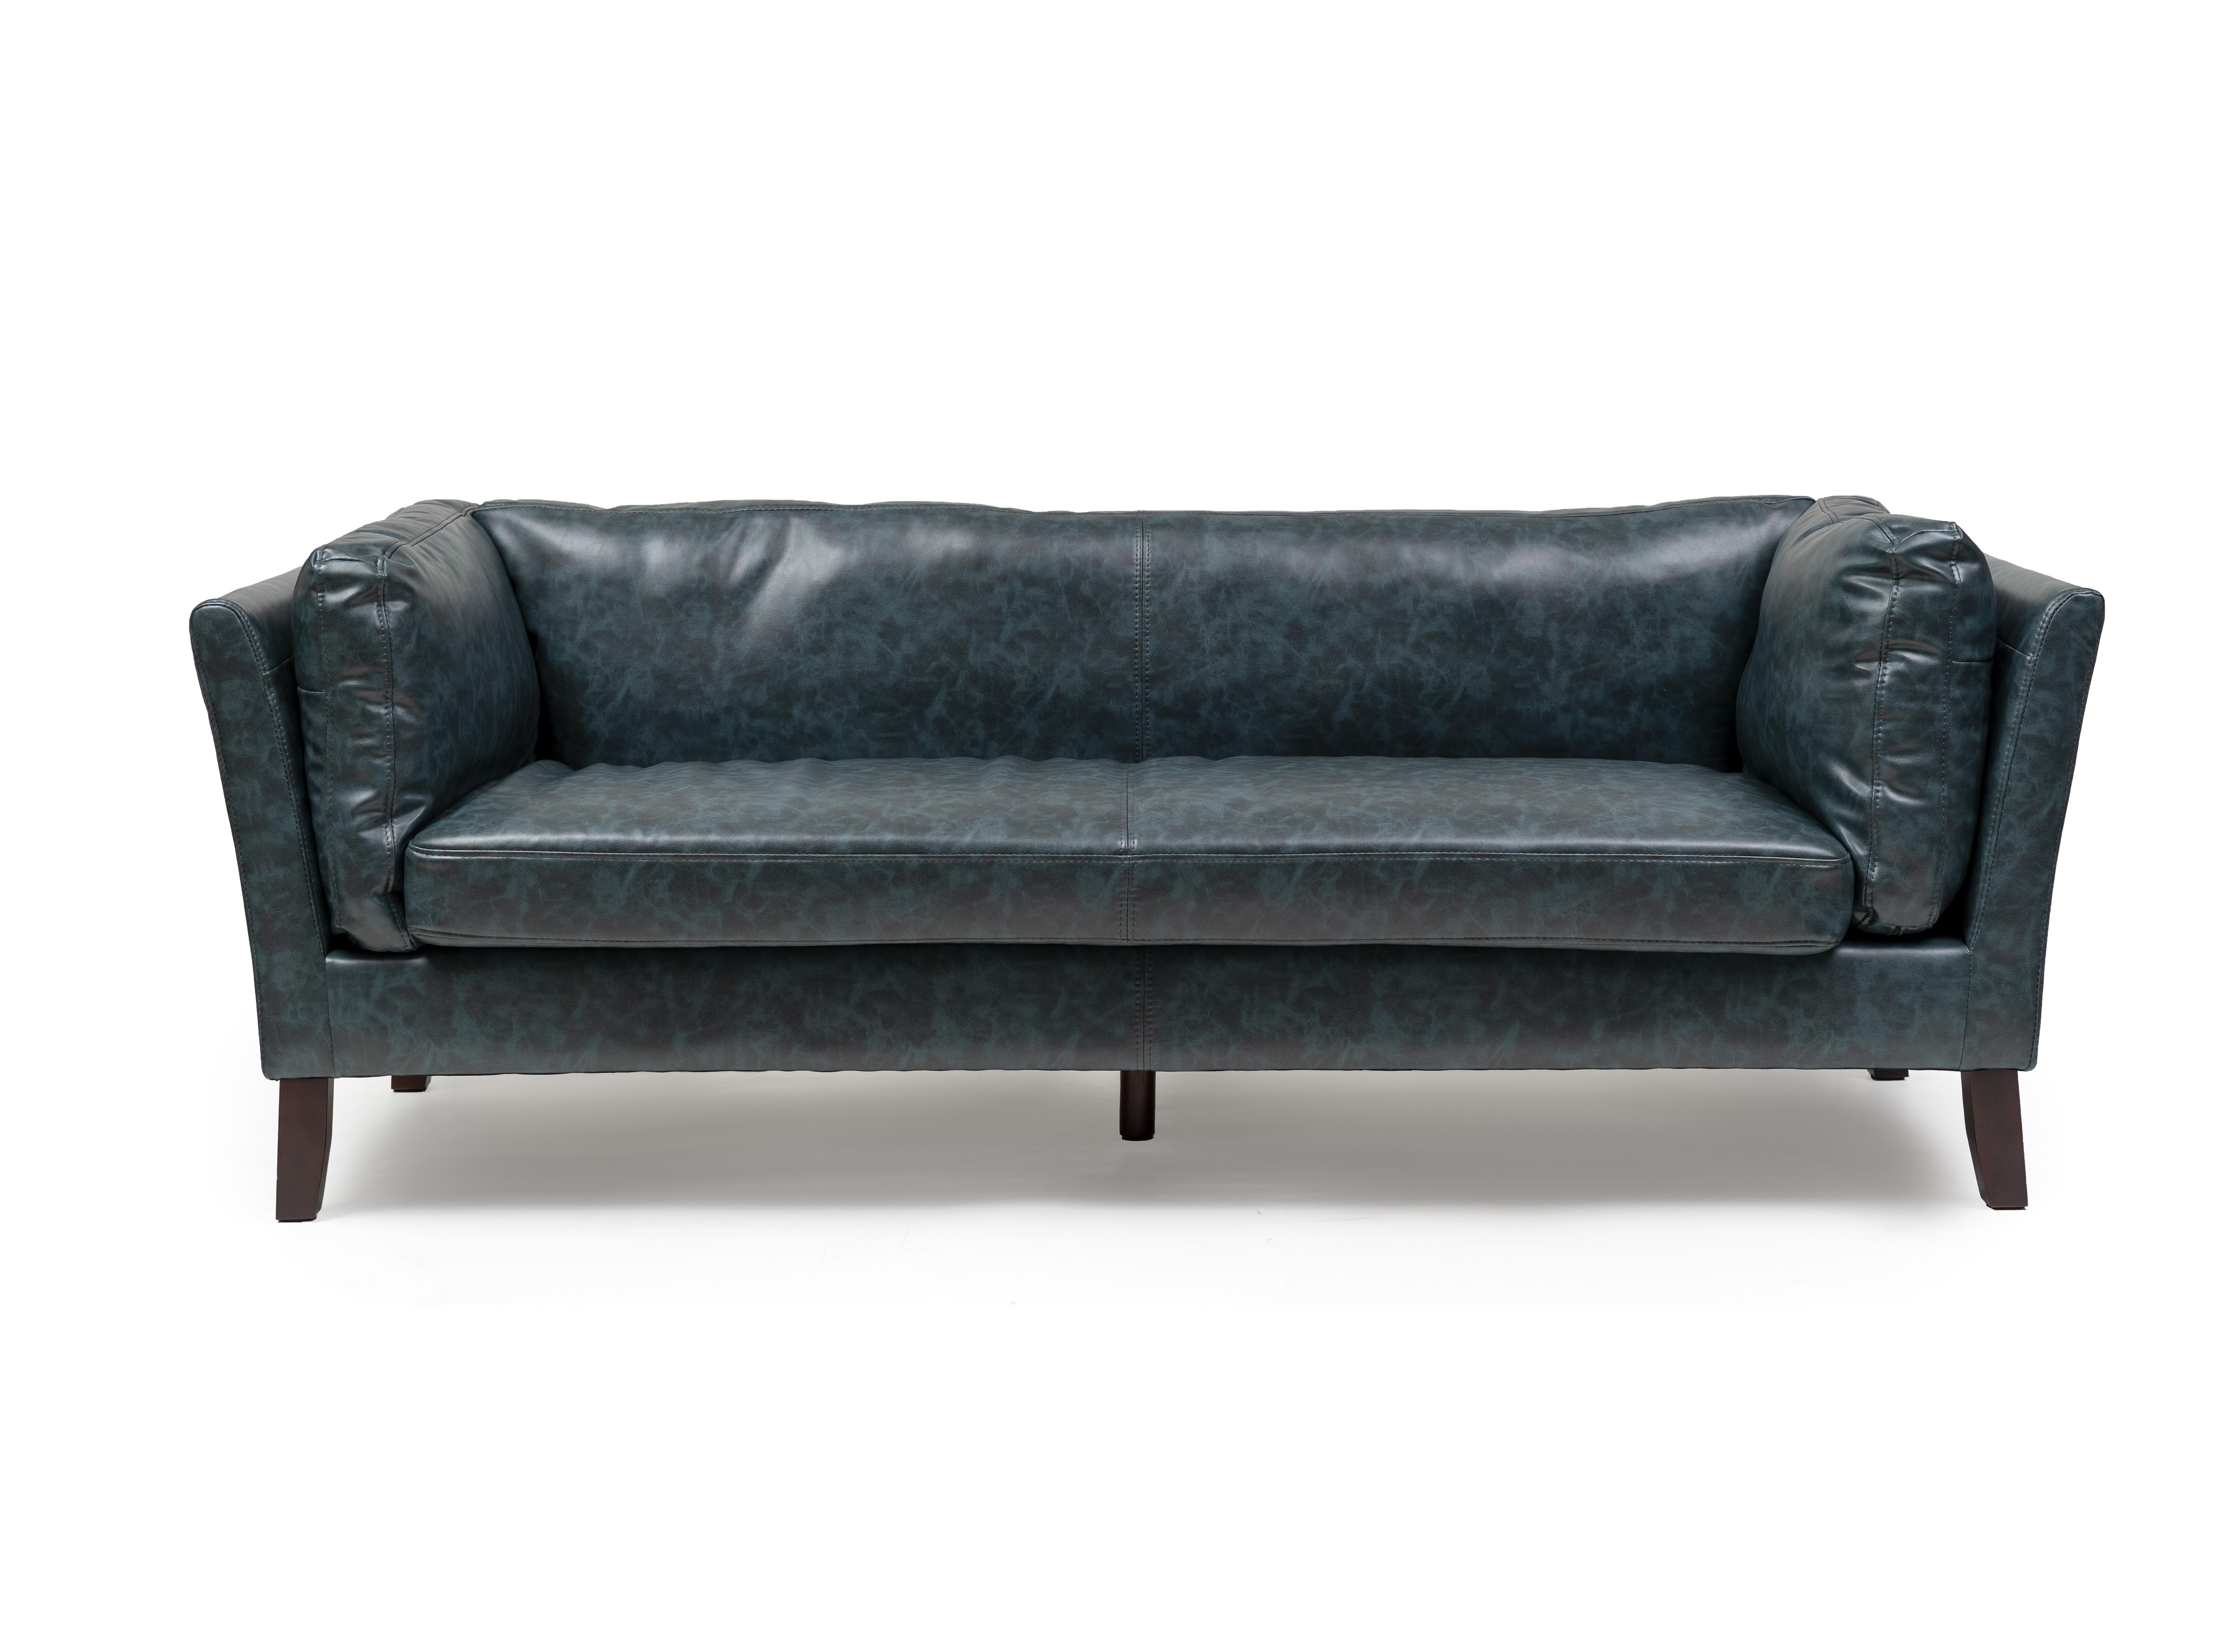 Kelly lounge диван kelly зеленом цвете зеленый 143685/143694